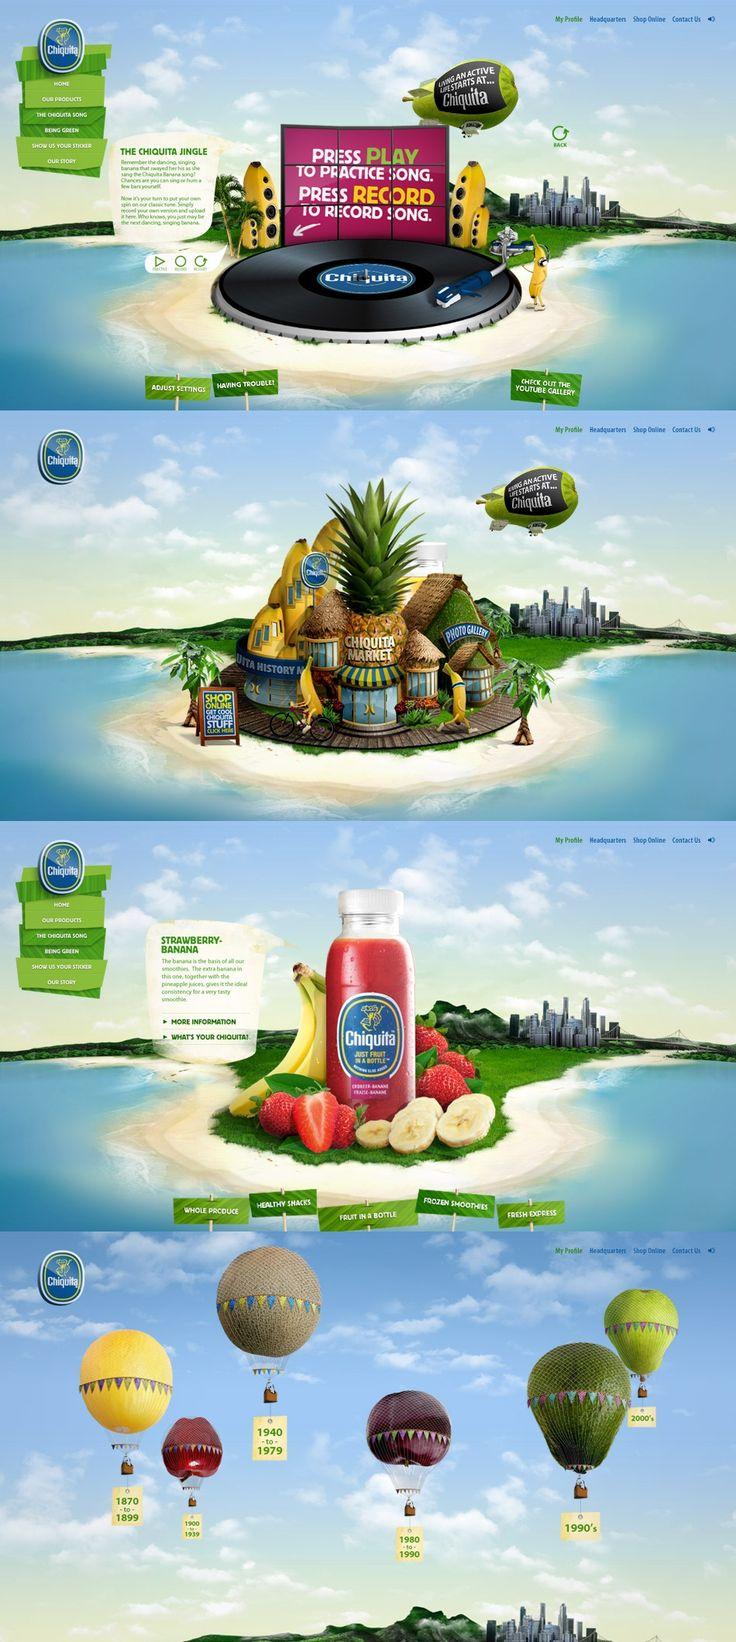 Chiquita | #webdesign #it #web #design #layout #userinterface #website #webdesign <<< repinned by an #advertising #agency from #Hamburg / #Germany - www.BlickeDeeler.de